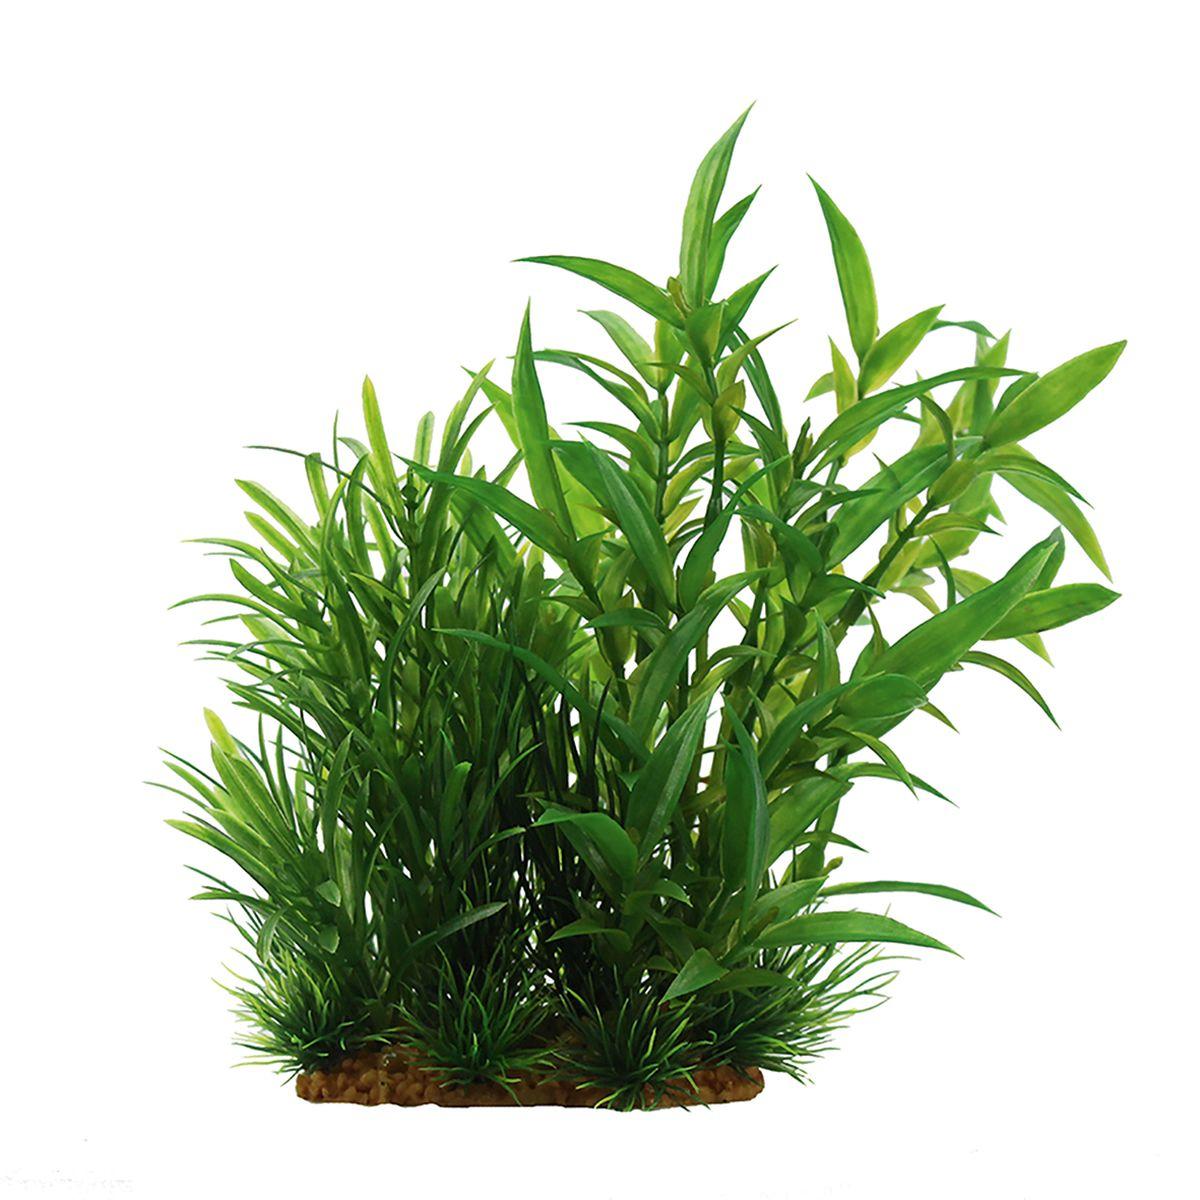 Растение для аквариума ArtUniq Гигрофила сиамская, высота 15 смART-1140101Растение для аквариума ArtUniq Гигрофила сиамская, высота 15 см